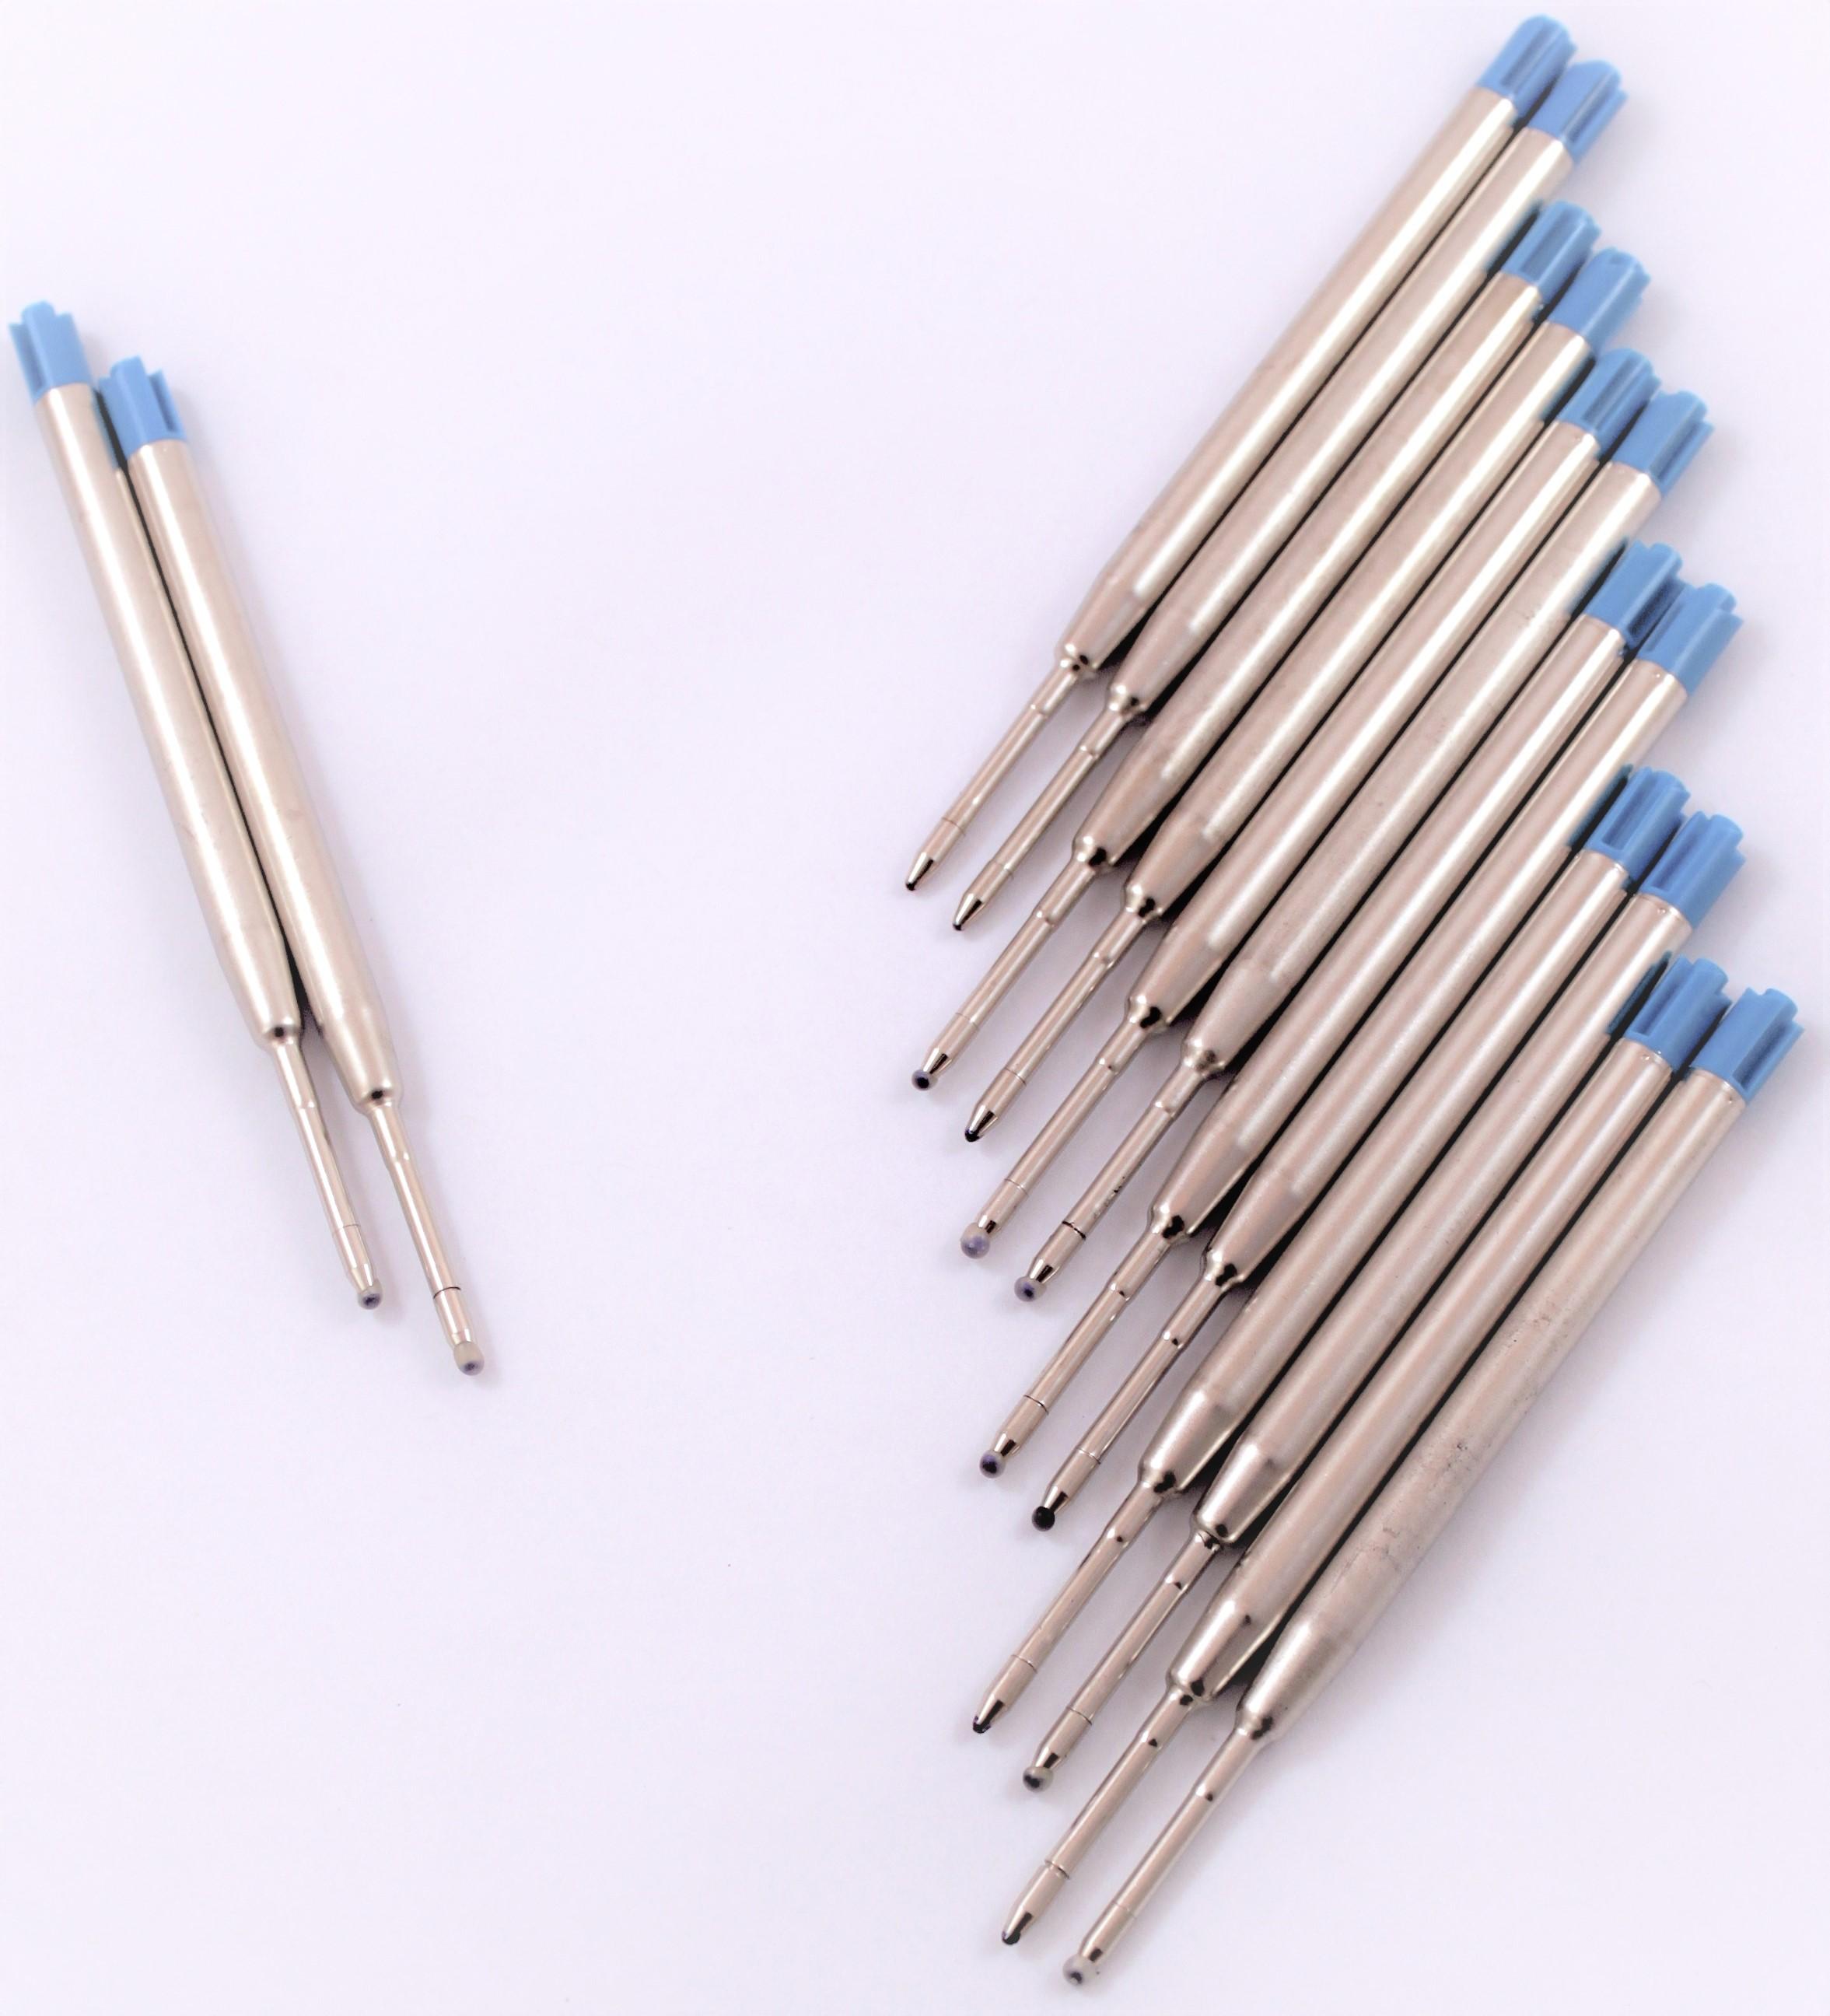 Kuliminen Mine Kugelschreibermine Minen blau Ersatzminen Kuli